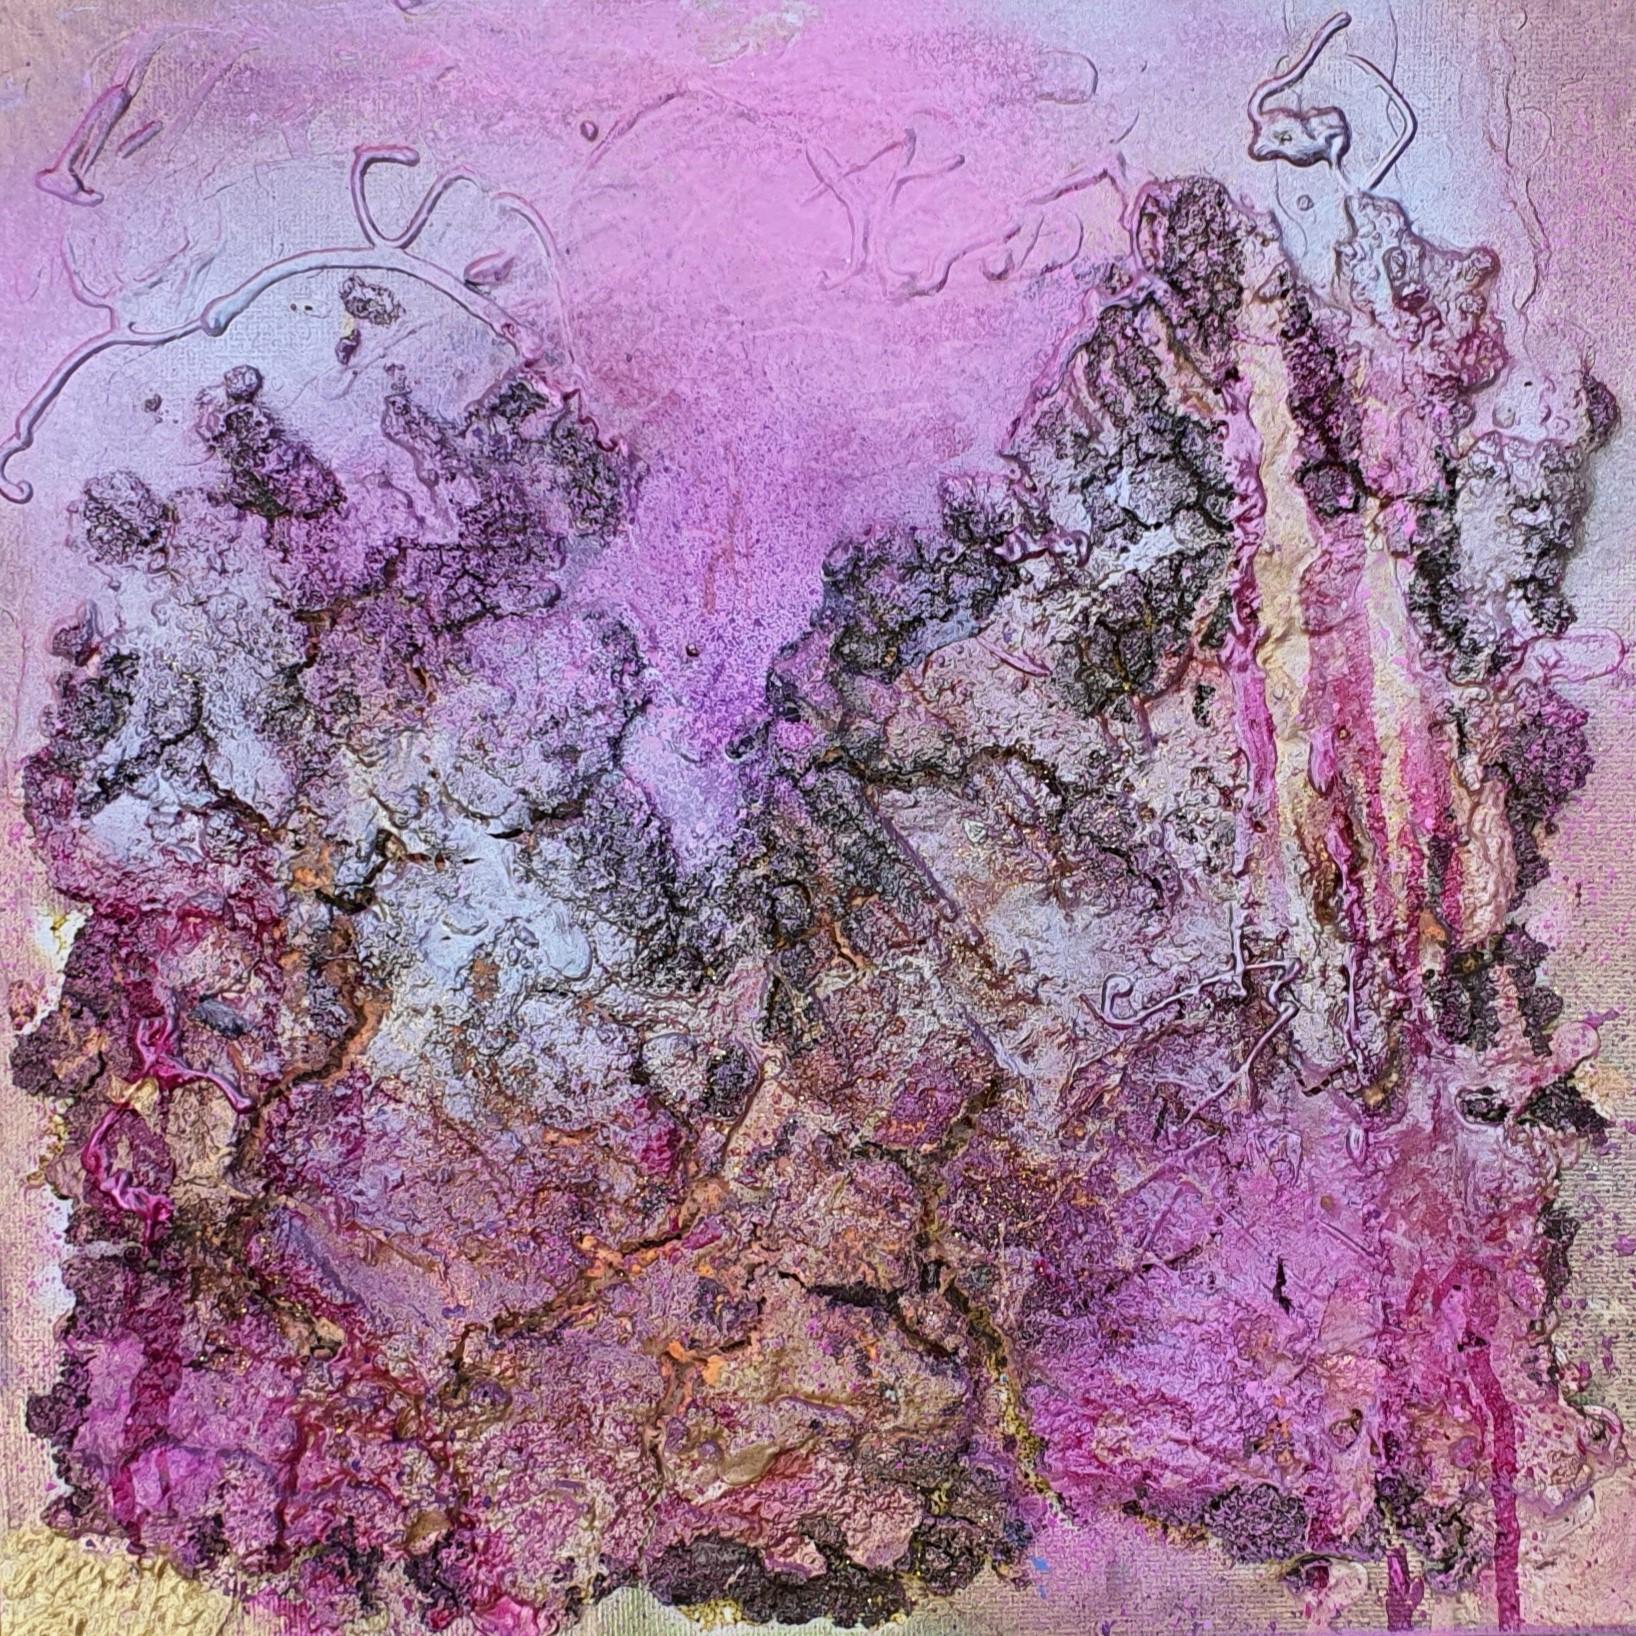 I love my life (Technik: Acryl/Mixed Media auf Canvas, 30 X 30 X 0,3 cm)